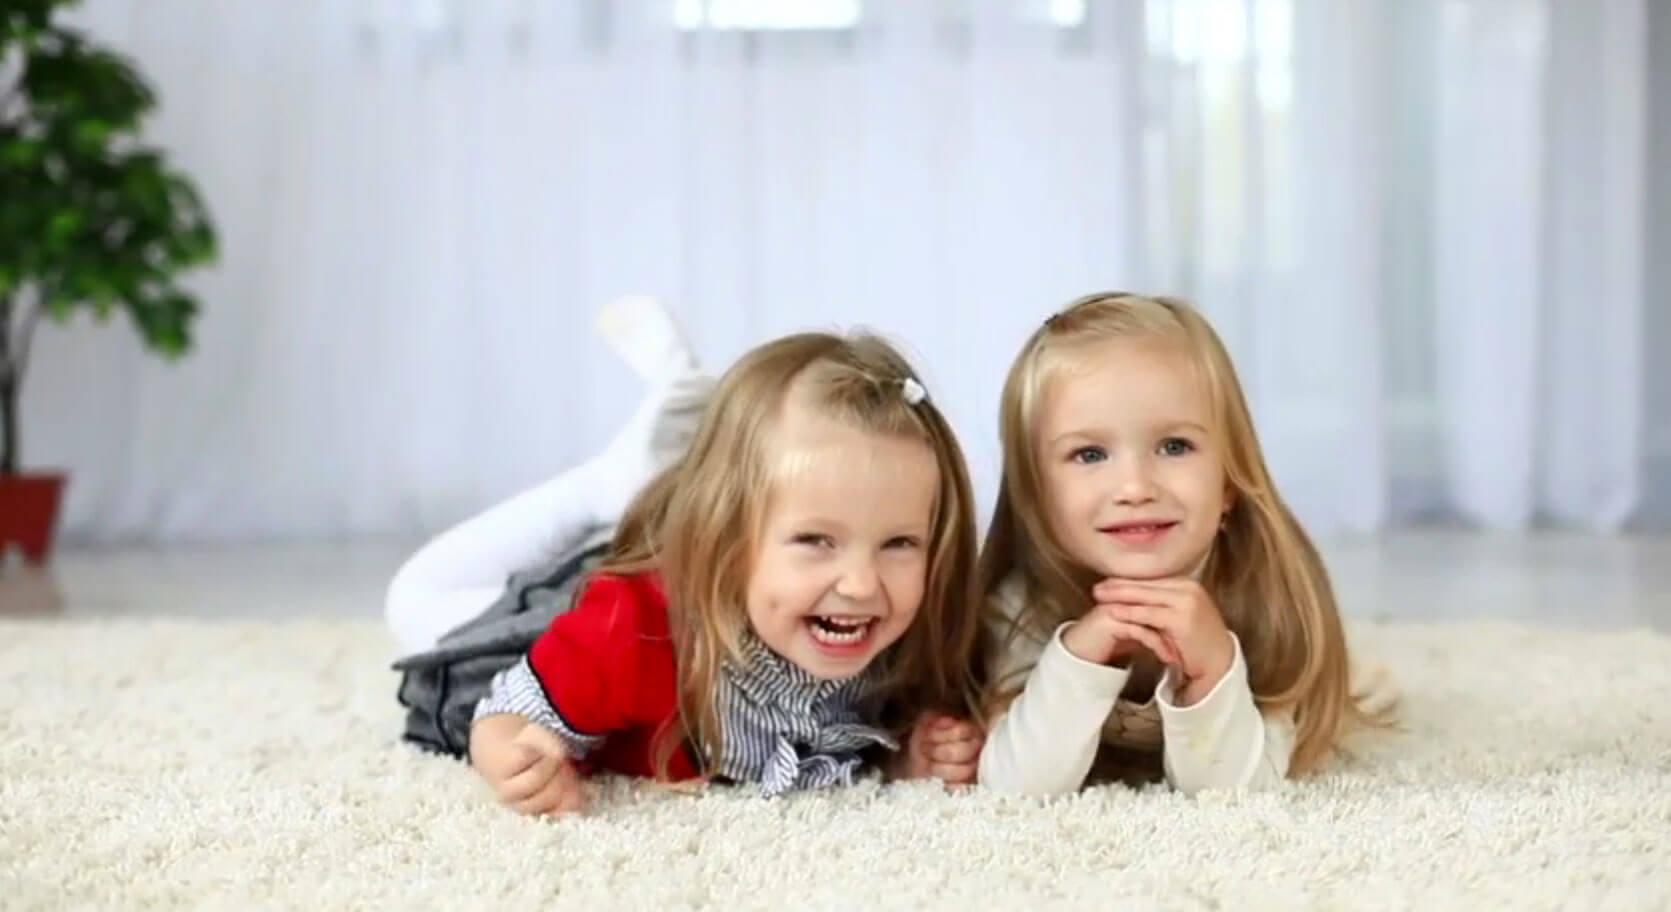 Carpet Cleaning Service Everett Lynwood Bothell Wa